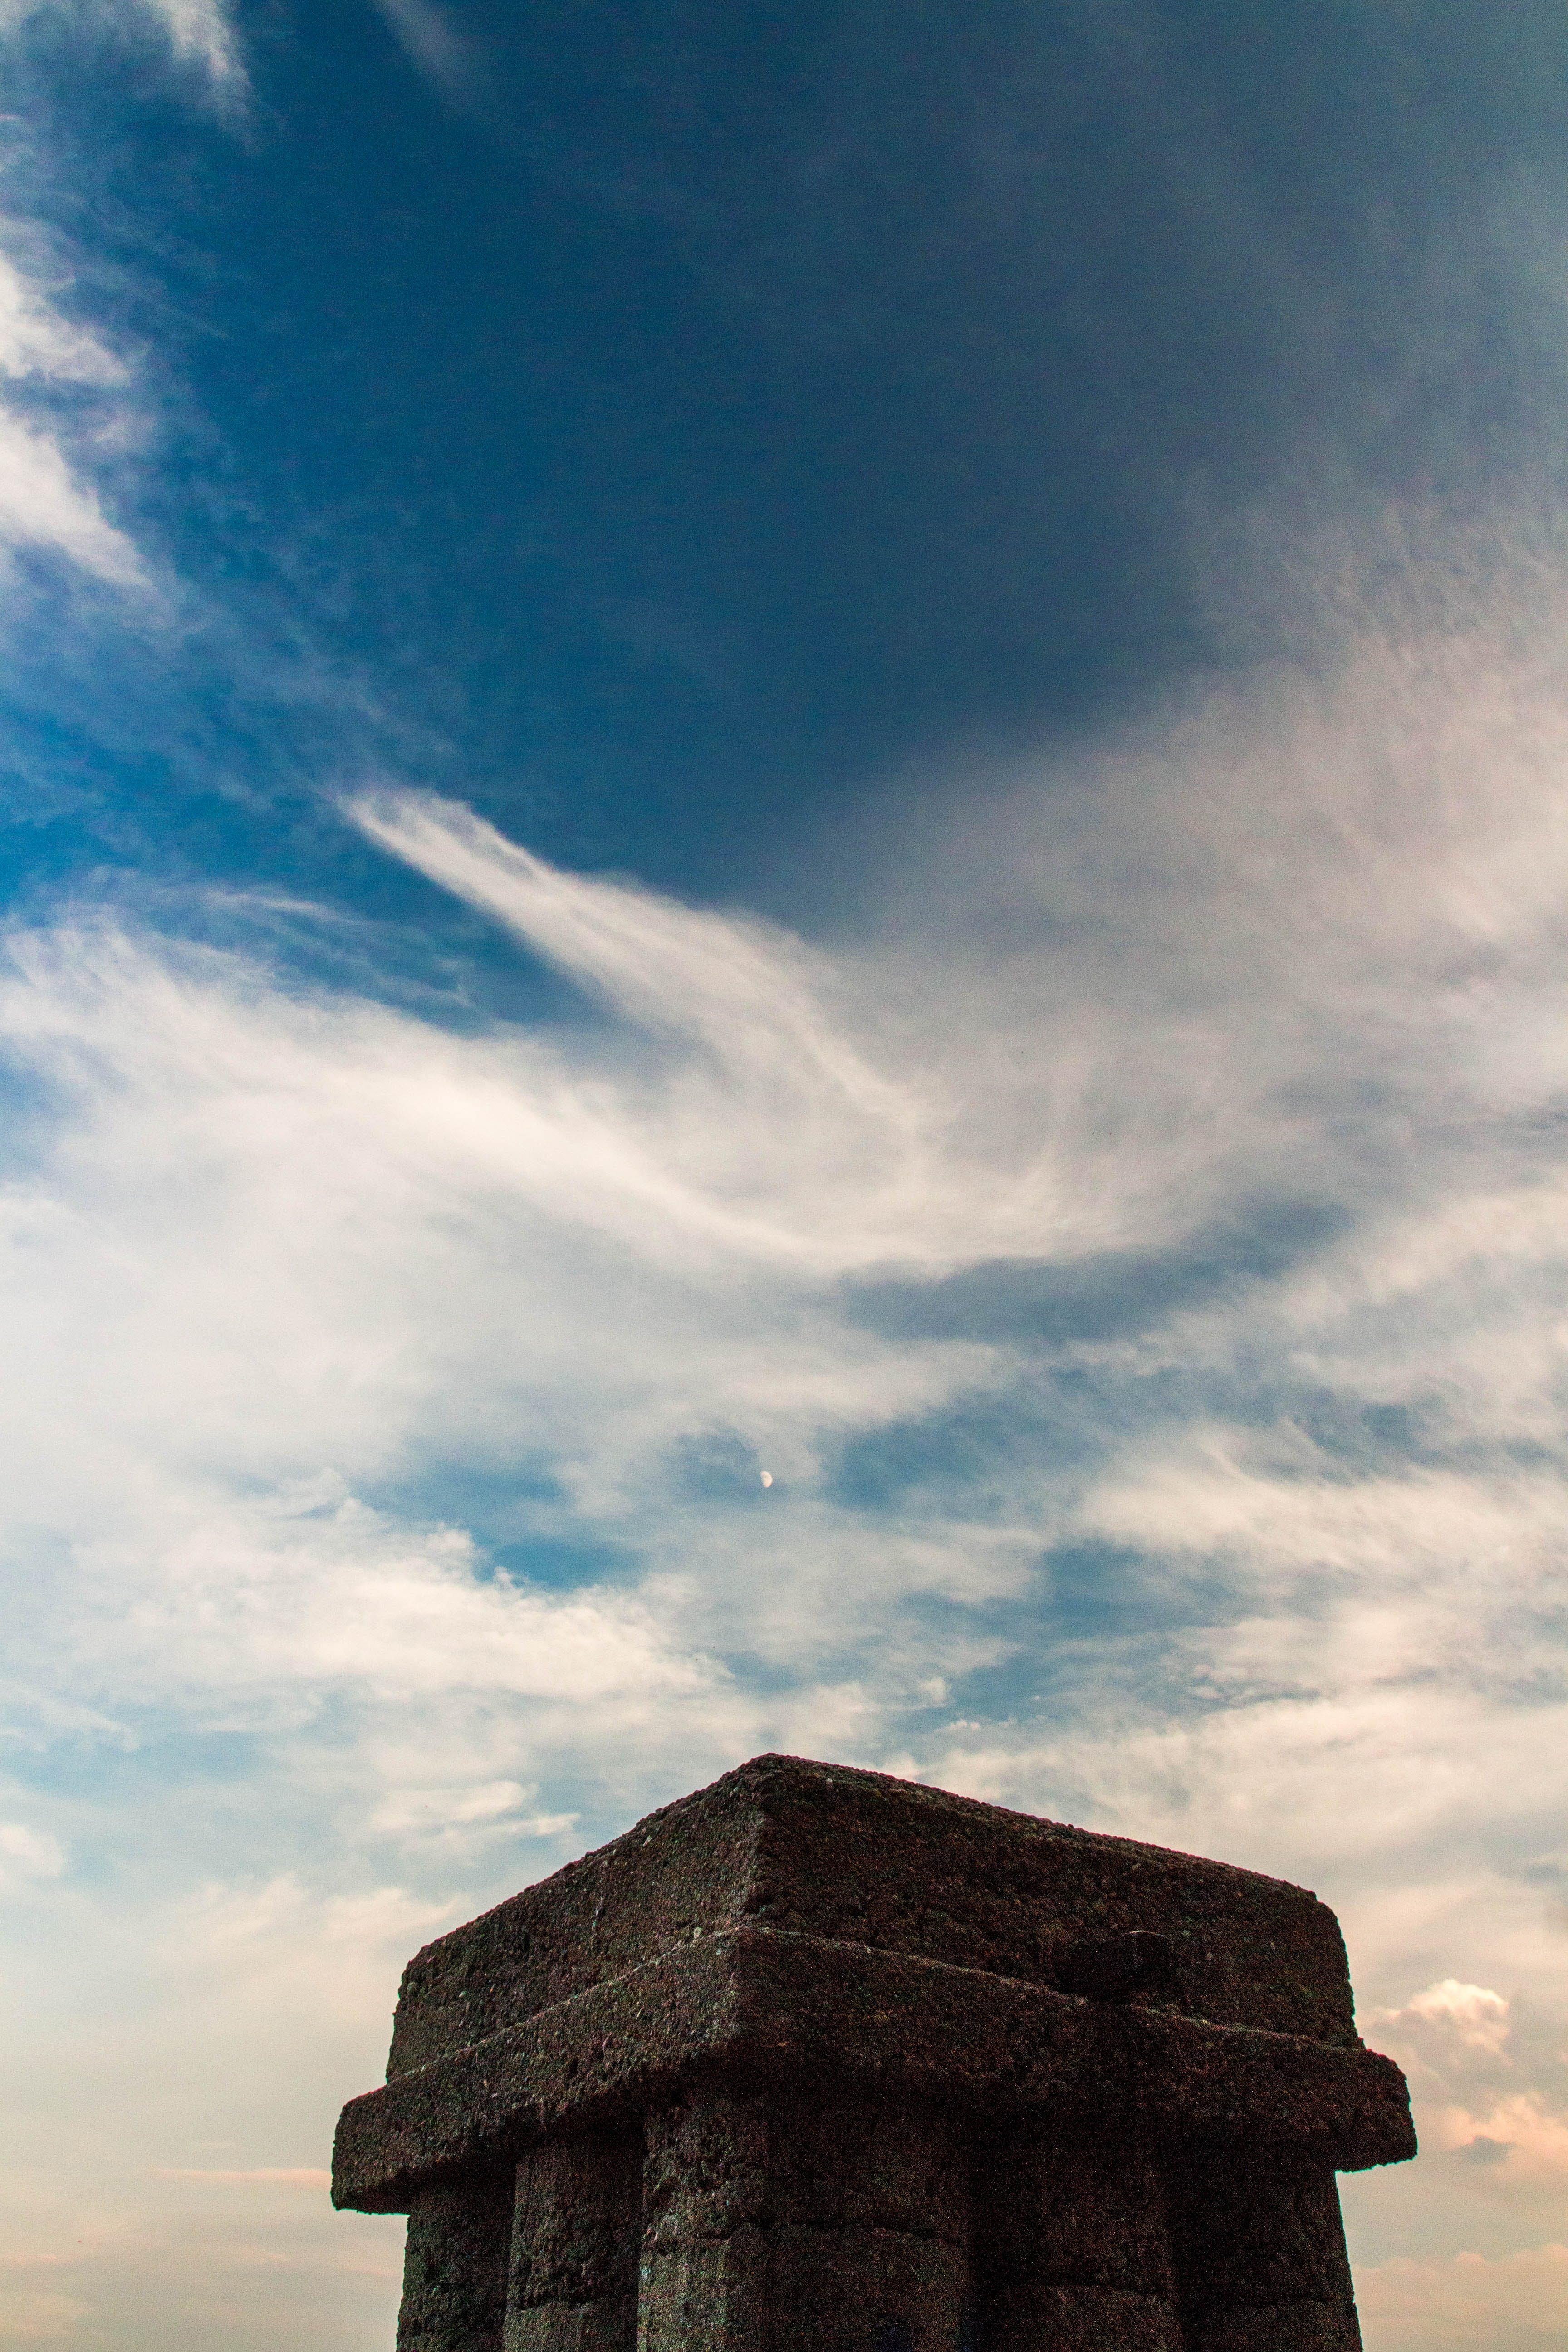 Temple Under Cloudy Sky